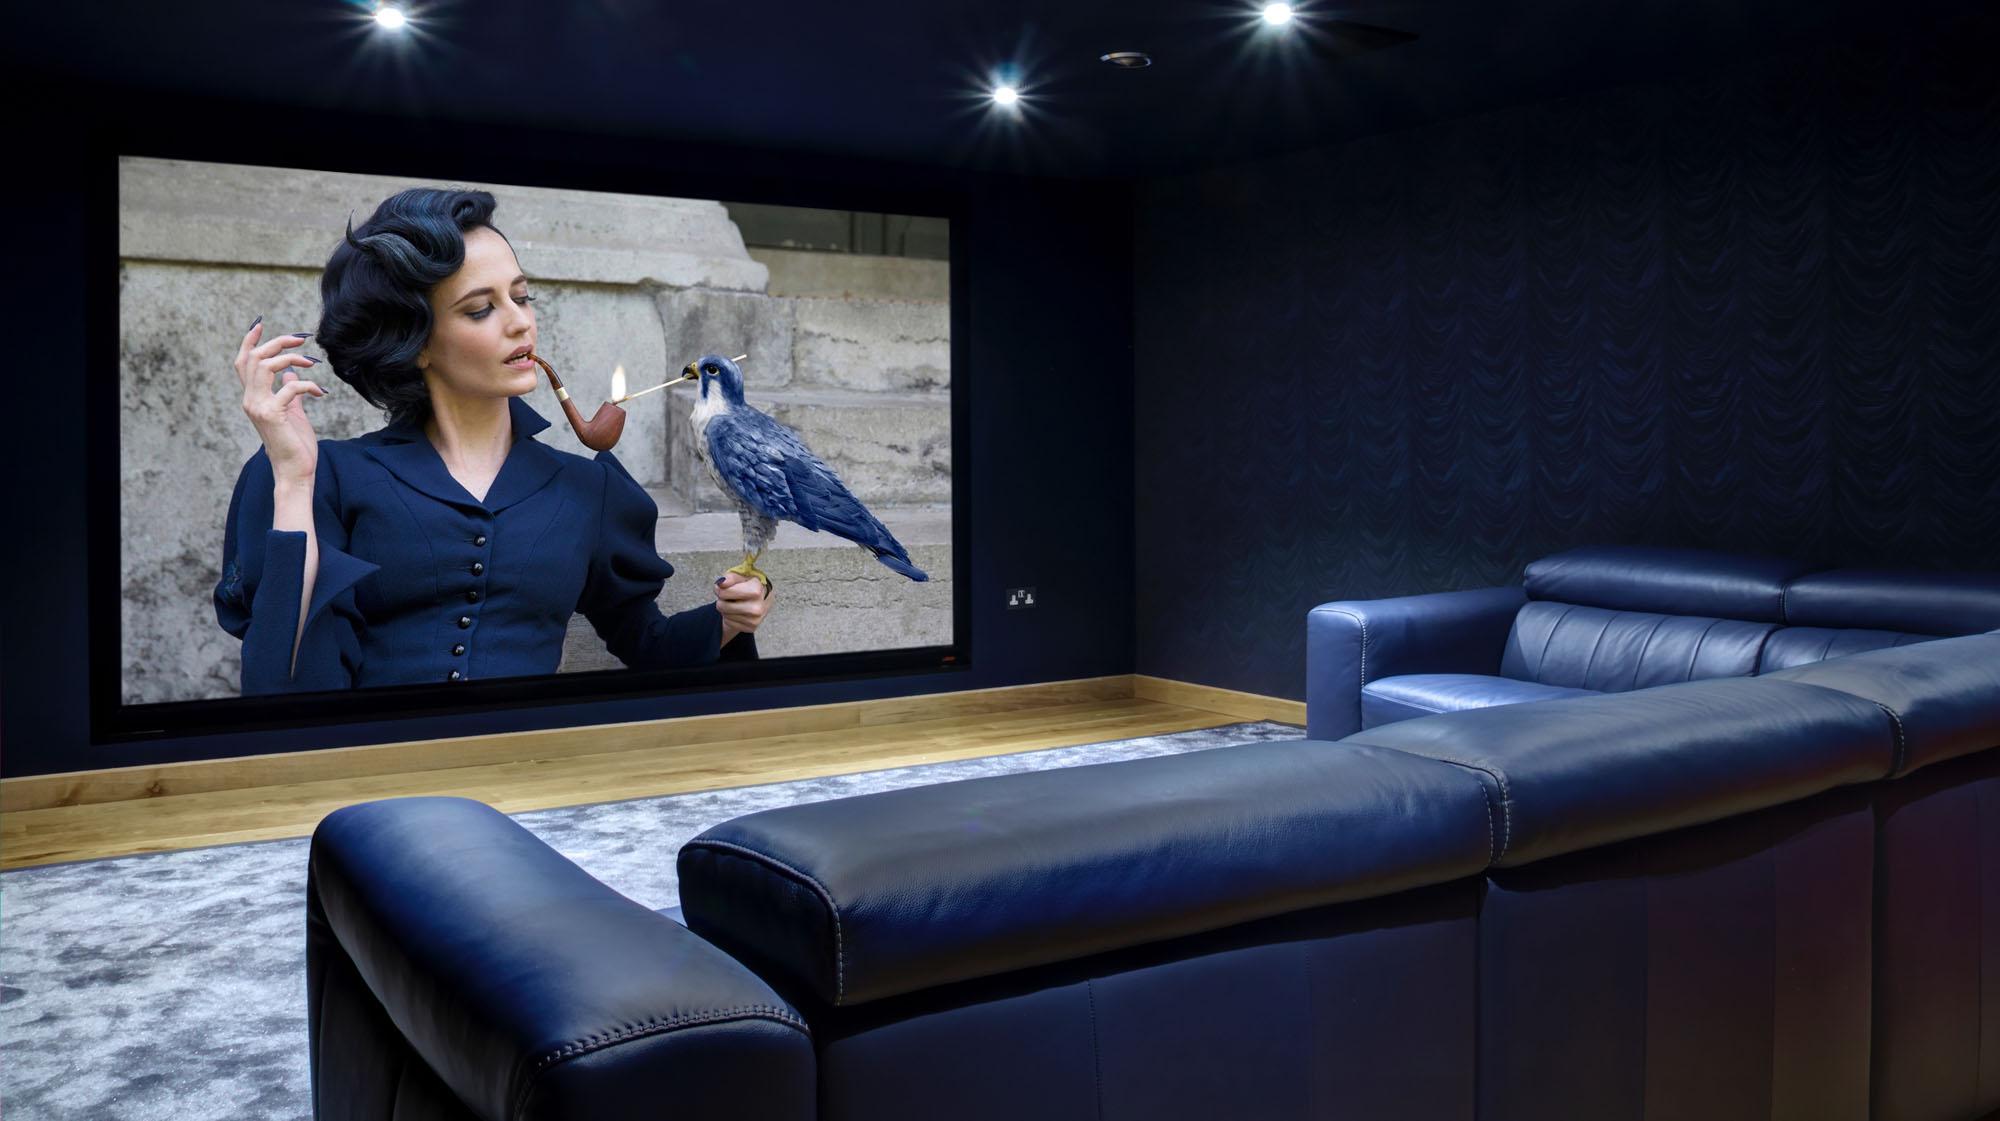 Artcoustic_Home_Cinema_Modus_Vivendi-4.jpg